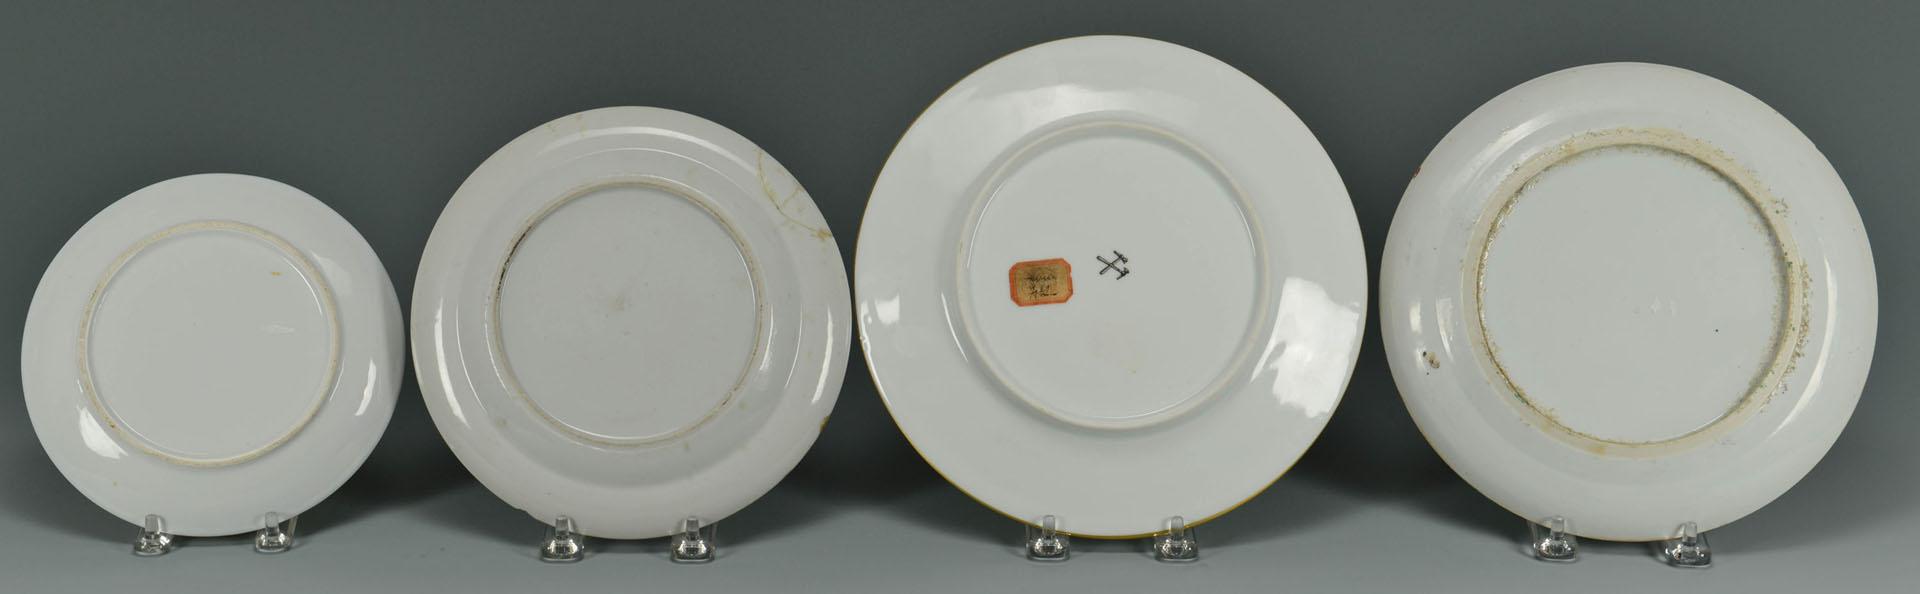 Lot 722: 4 Asian Themed Porcelain Plates